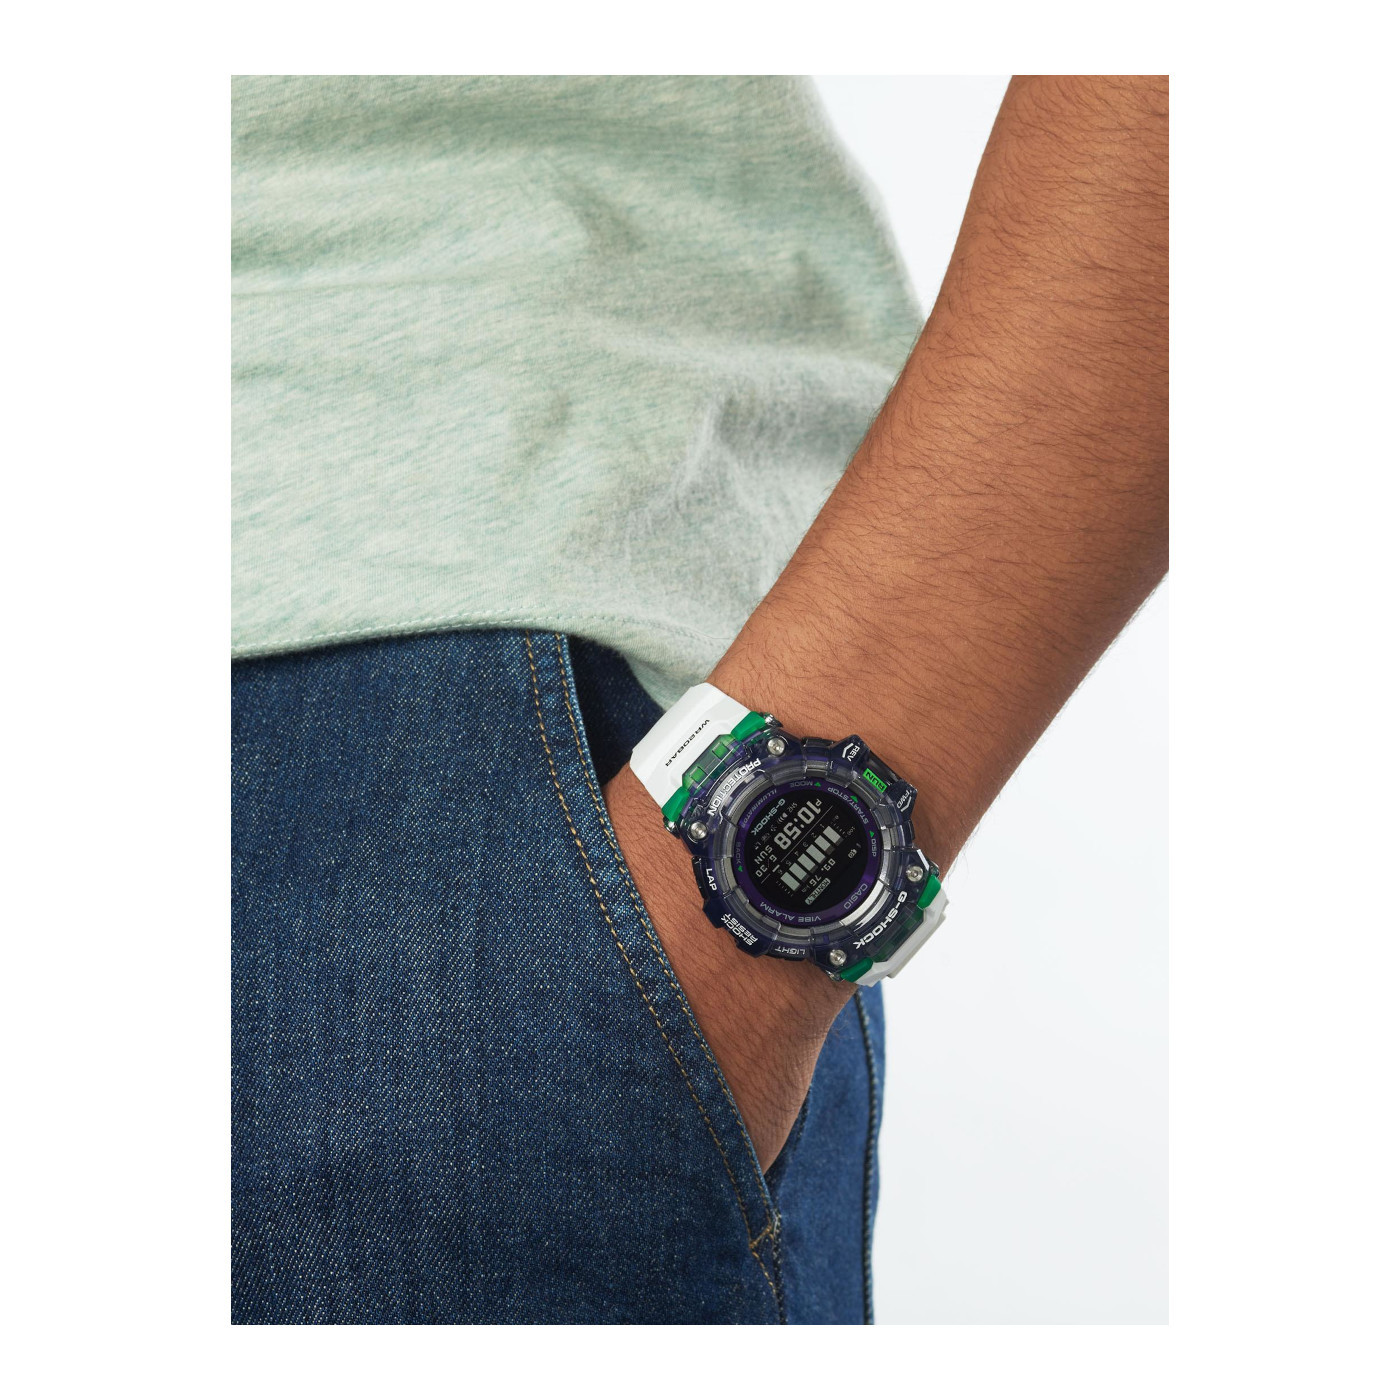 G-Shock Display Smartwatch GBD-100SM-1A7ER